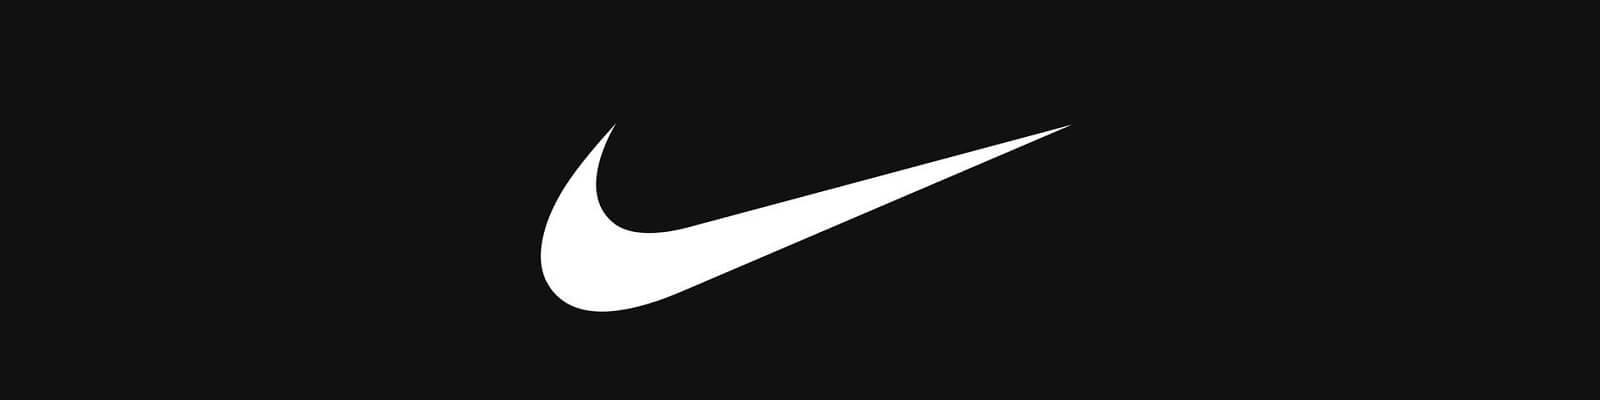 "Nike é confiável e segura? Análise definitiva<span class=""wtr-time-wrap after-title""><span class=""wtr-time-number"">7</span> minutos de leitura</span>"